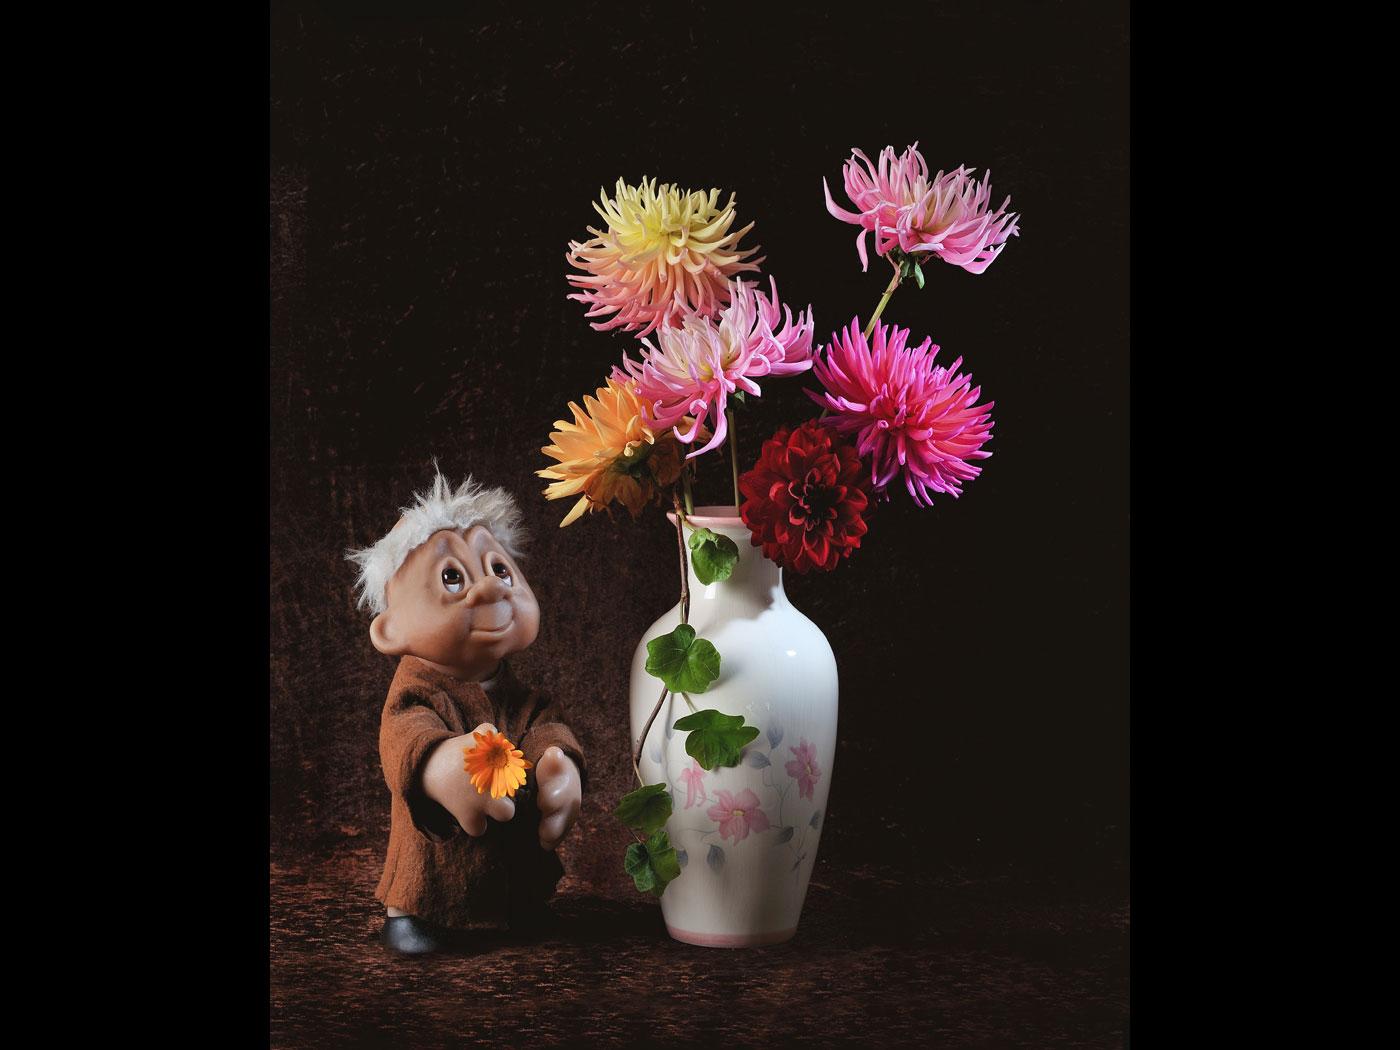 Flower Power, by Alan Cadman